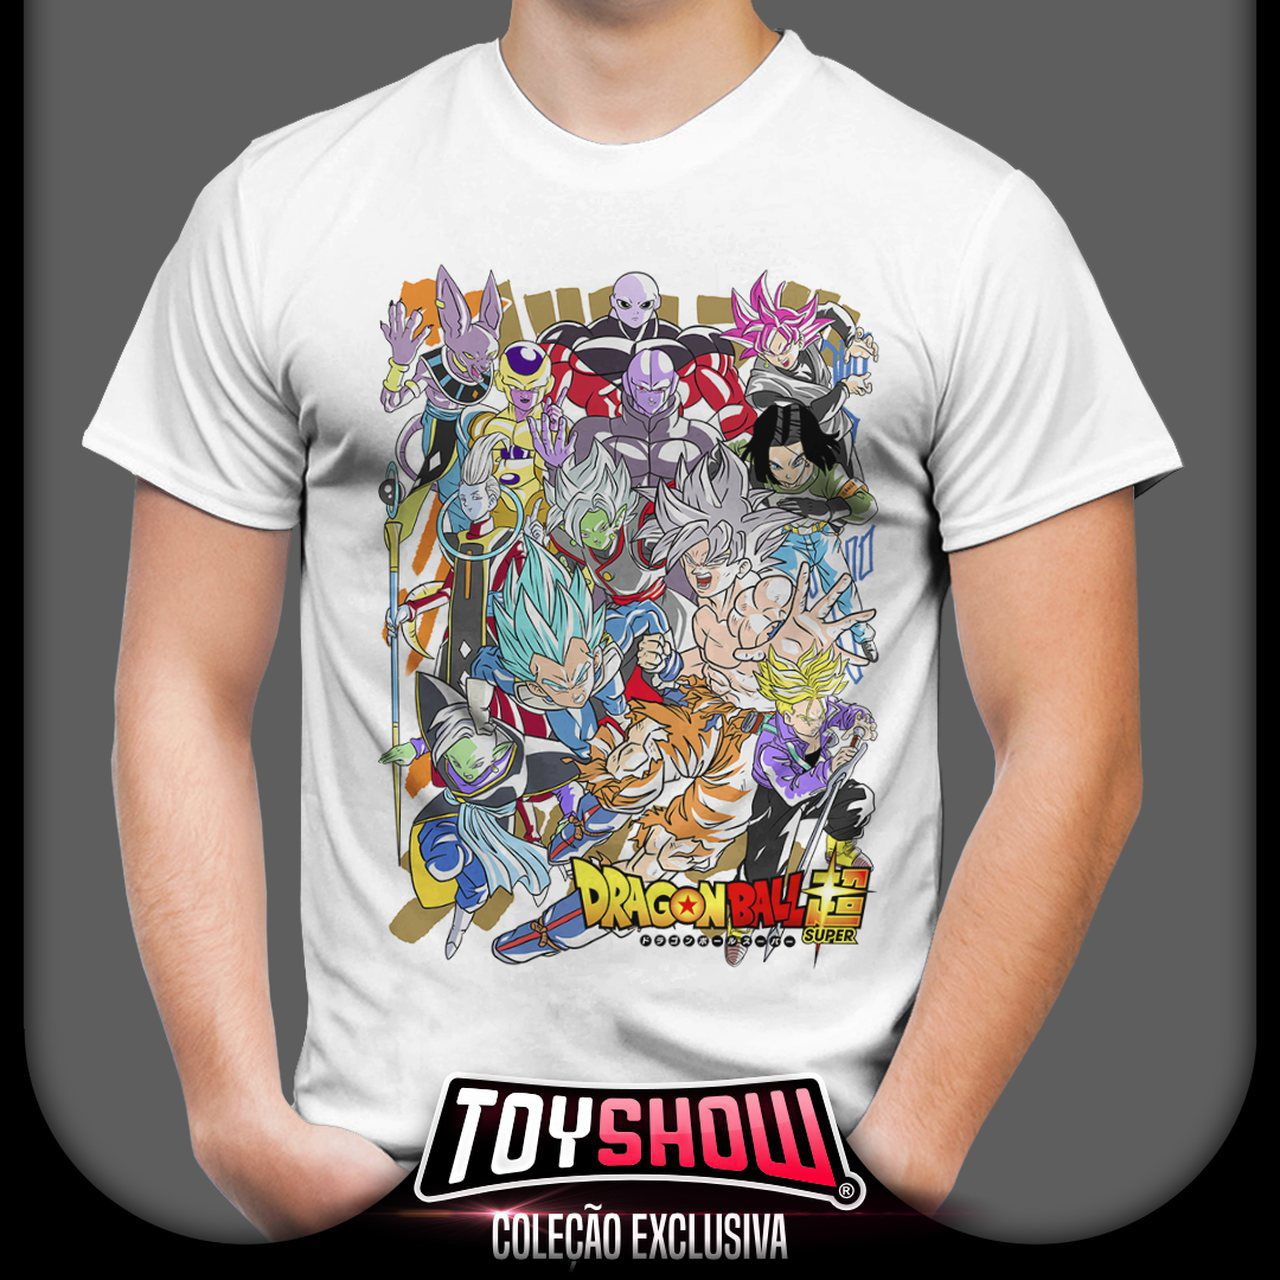 Camiseta Unissex Personagens Dragon Ball Super - Exclusiva Toyshow - EV - Anime Mangá